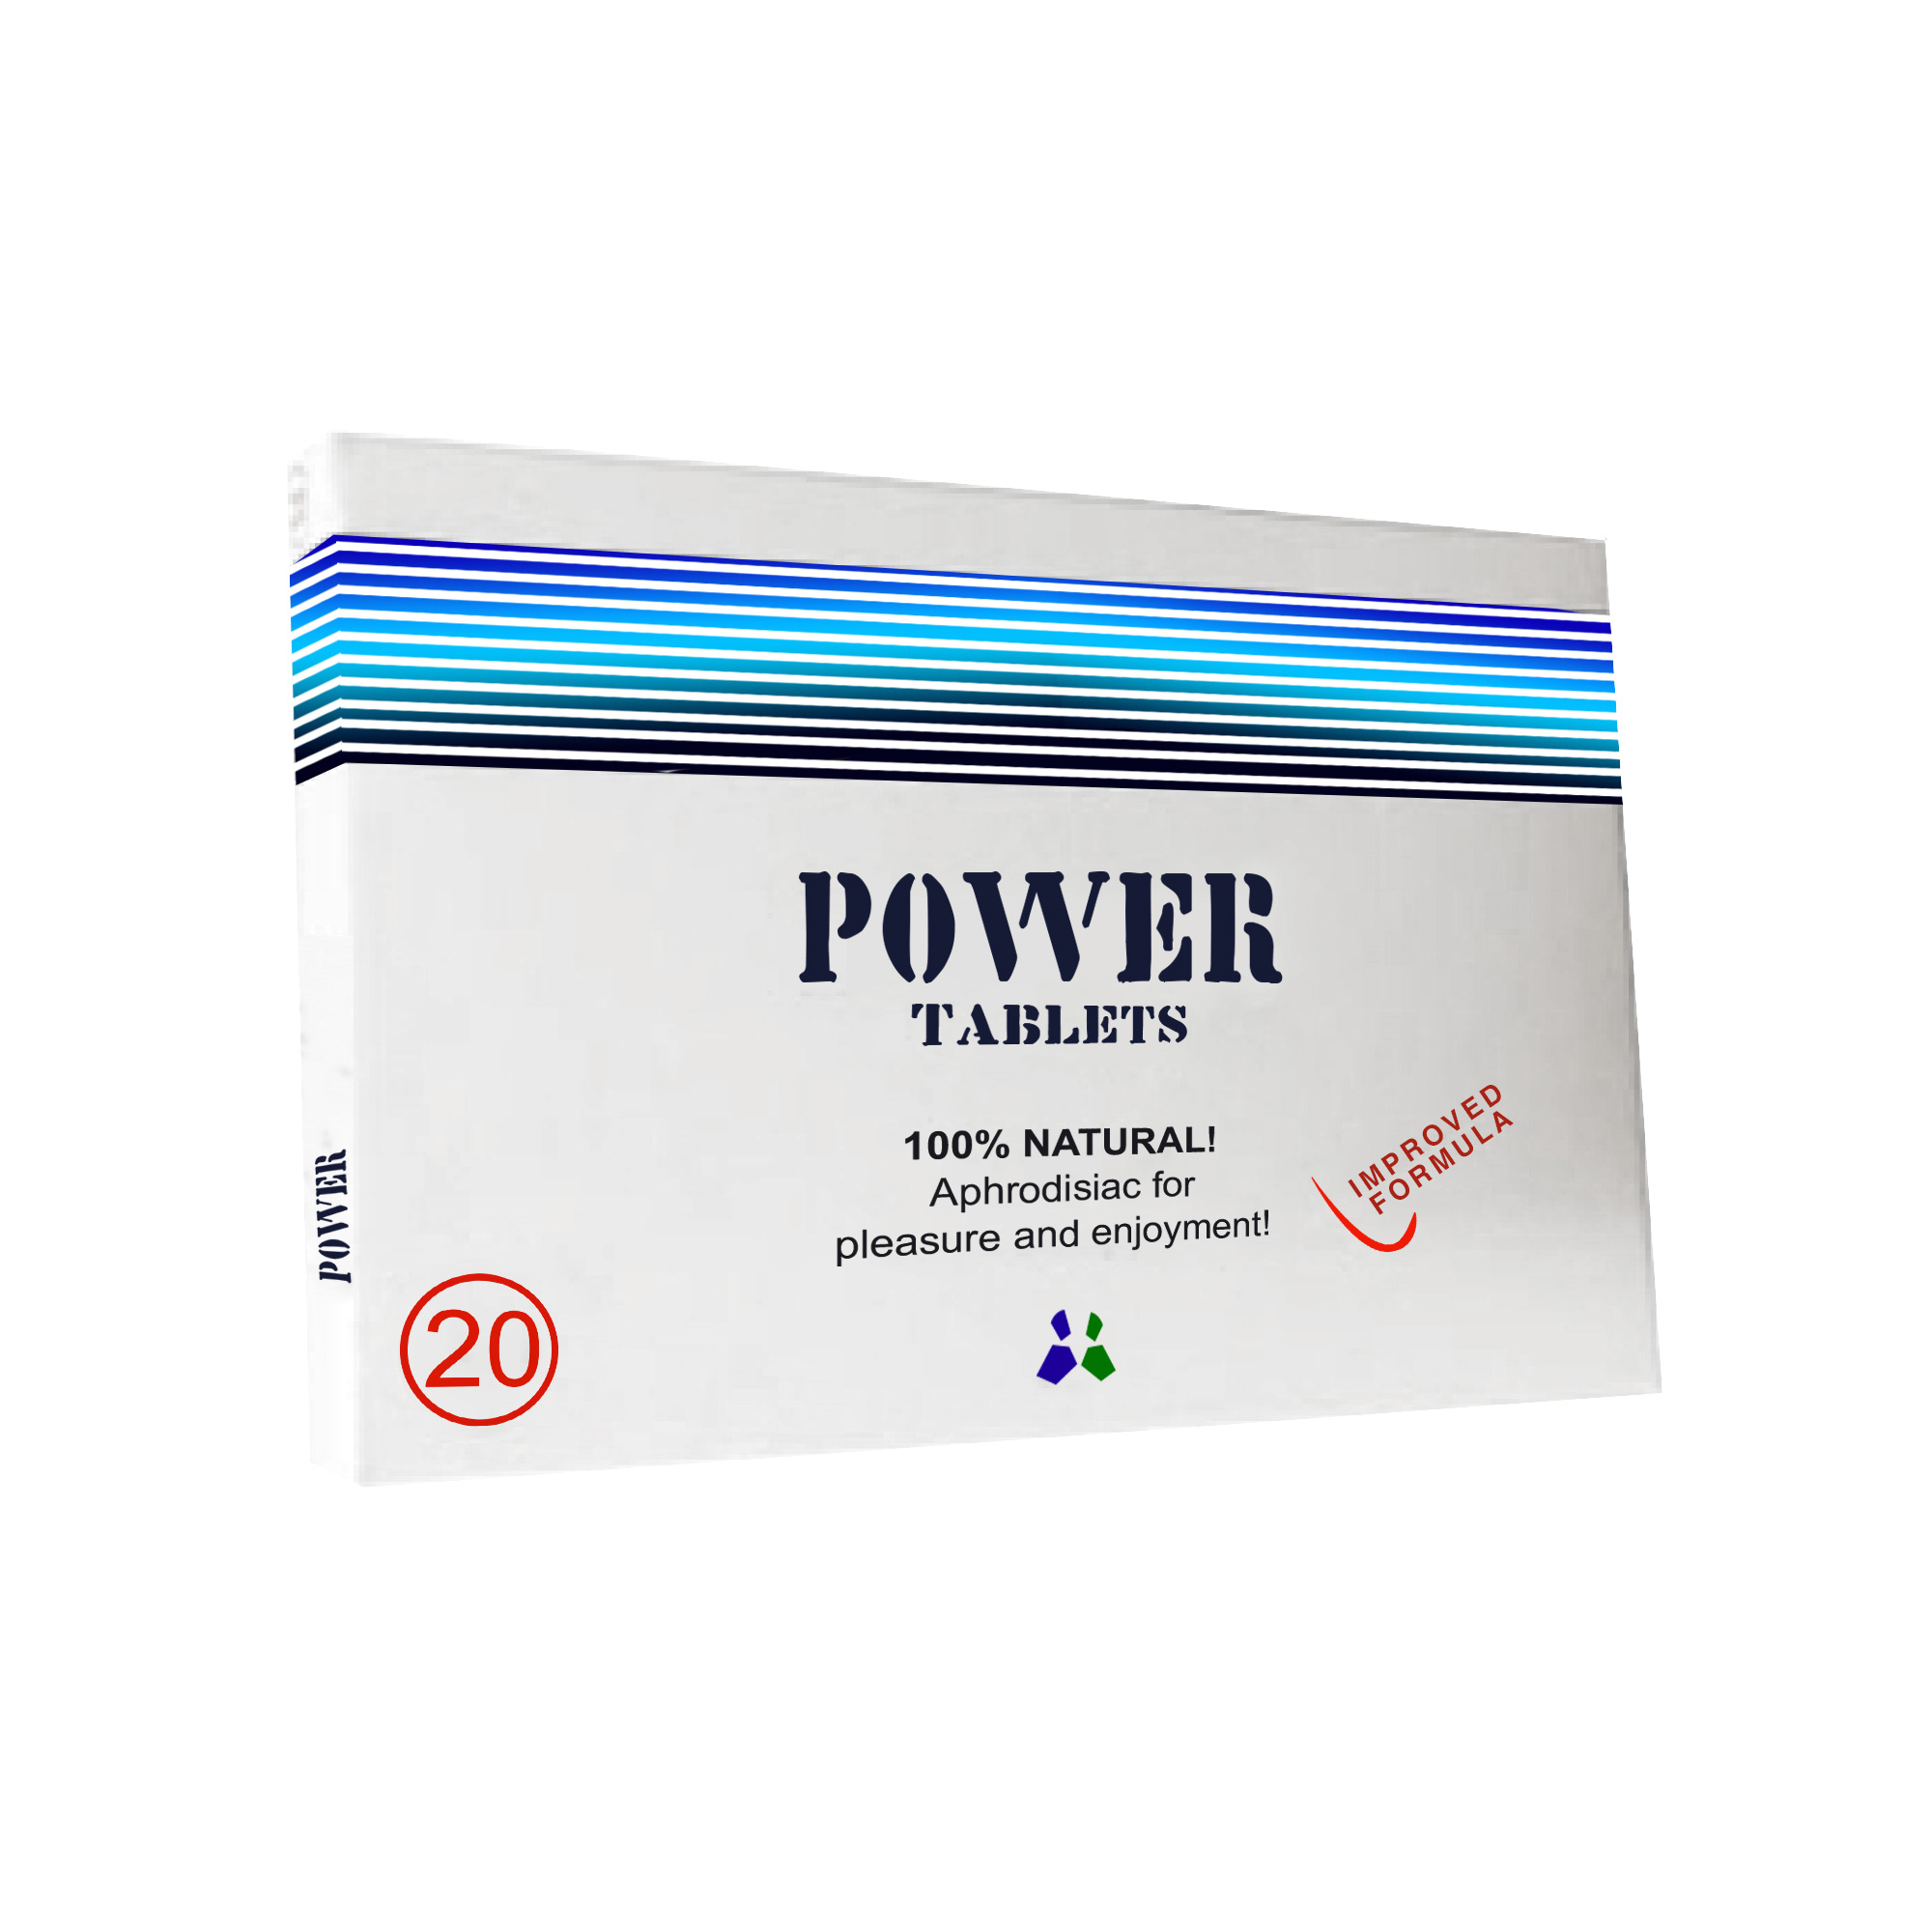 Power Tablets 20 pcs